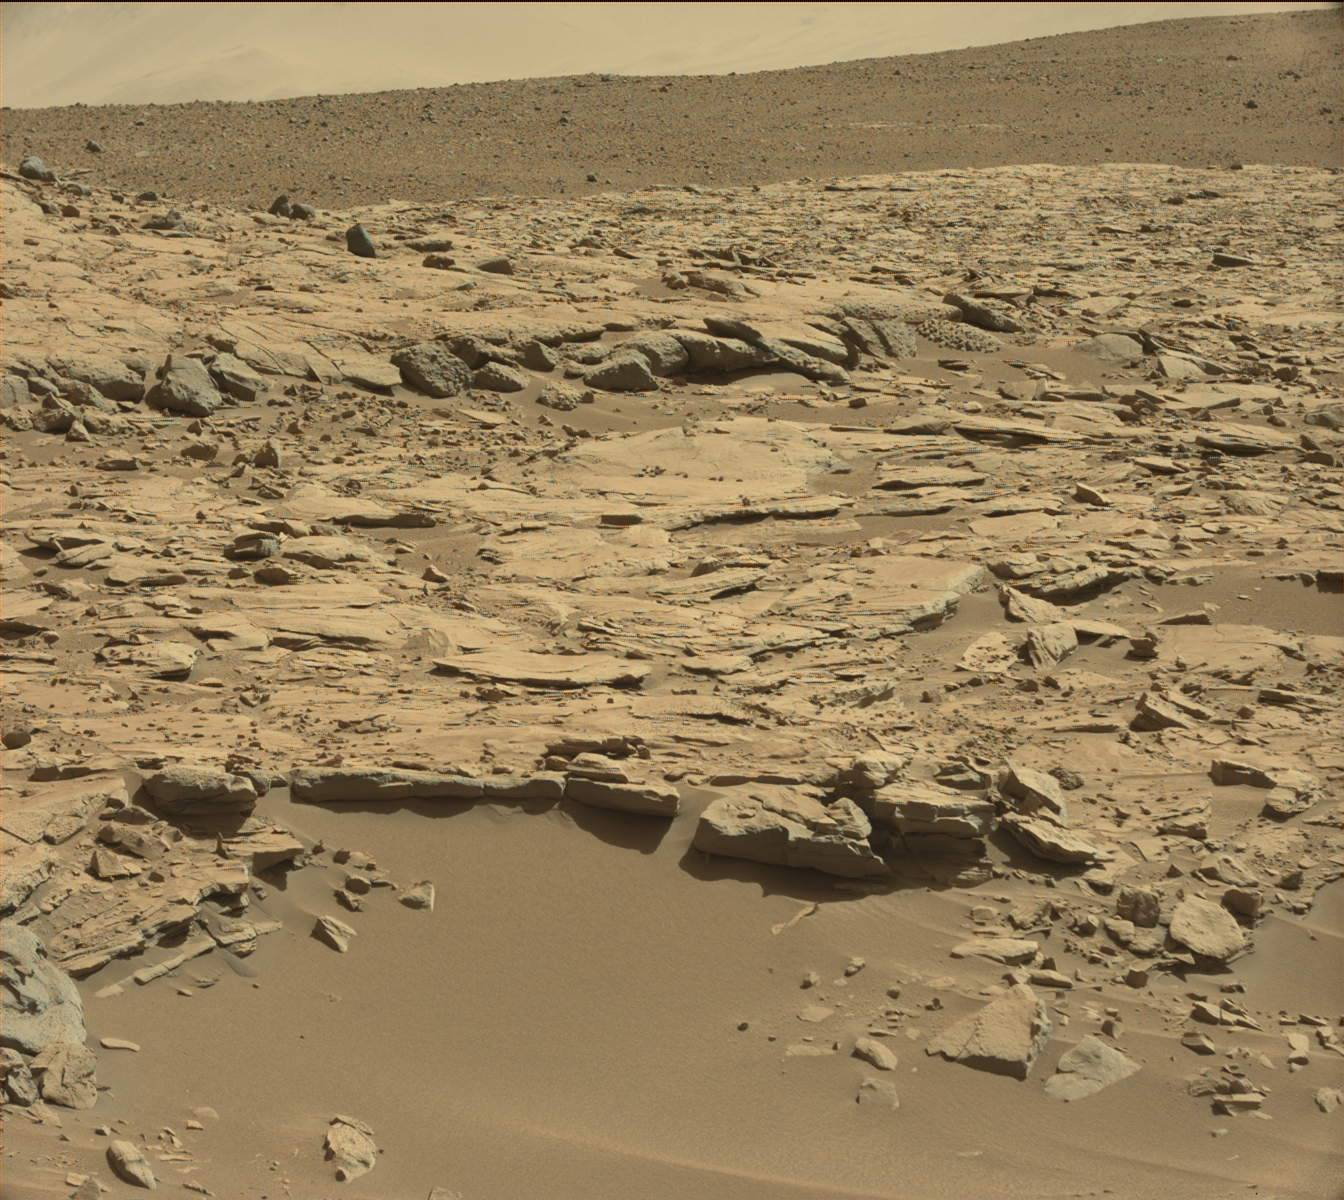 NASA JPL Curiosity Mars Anomolies - Pics about space